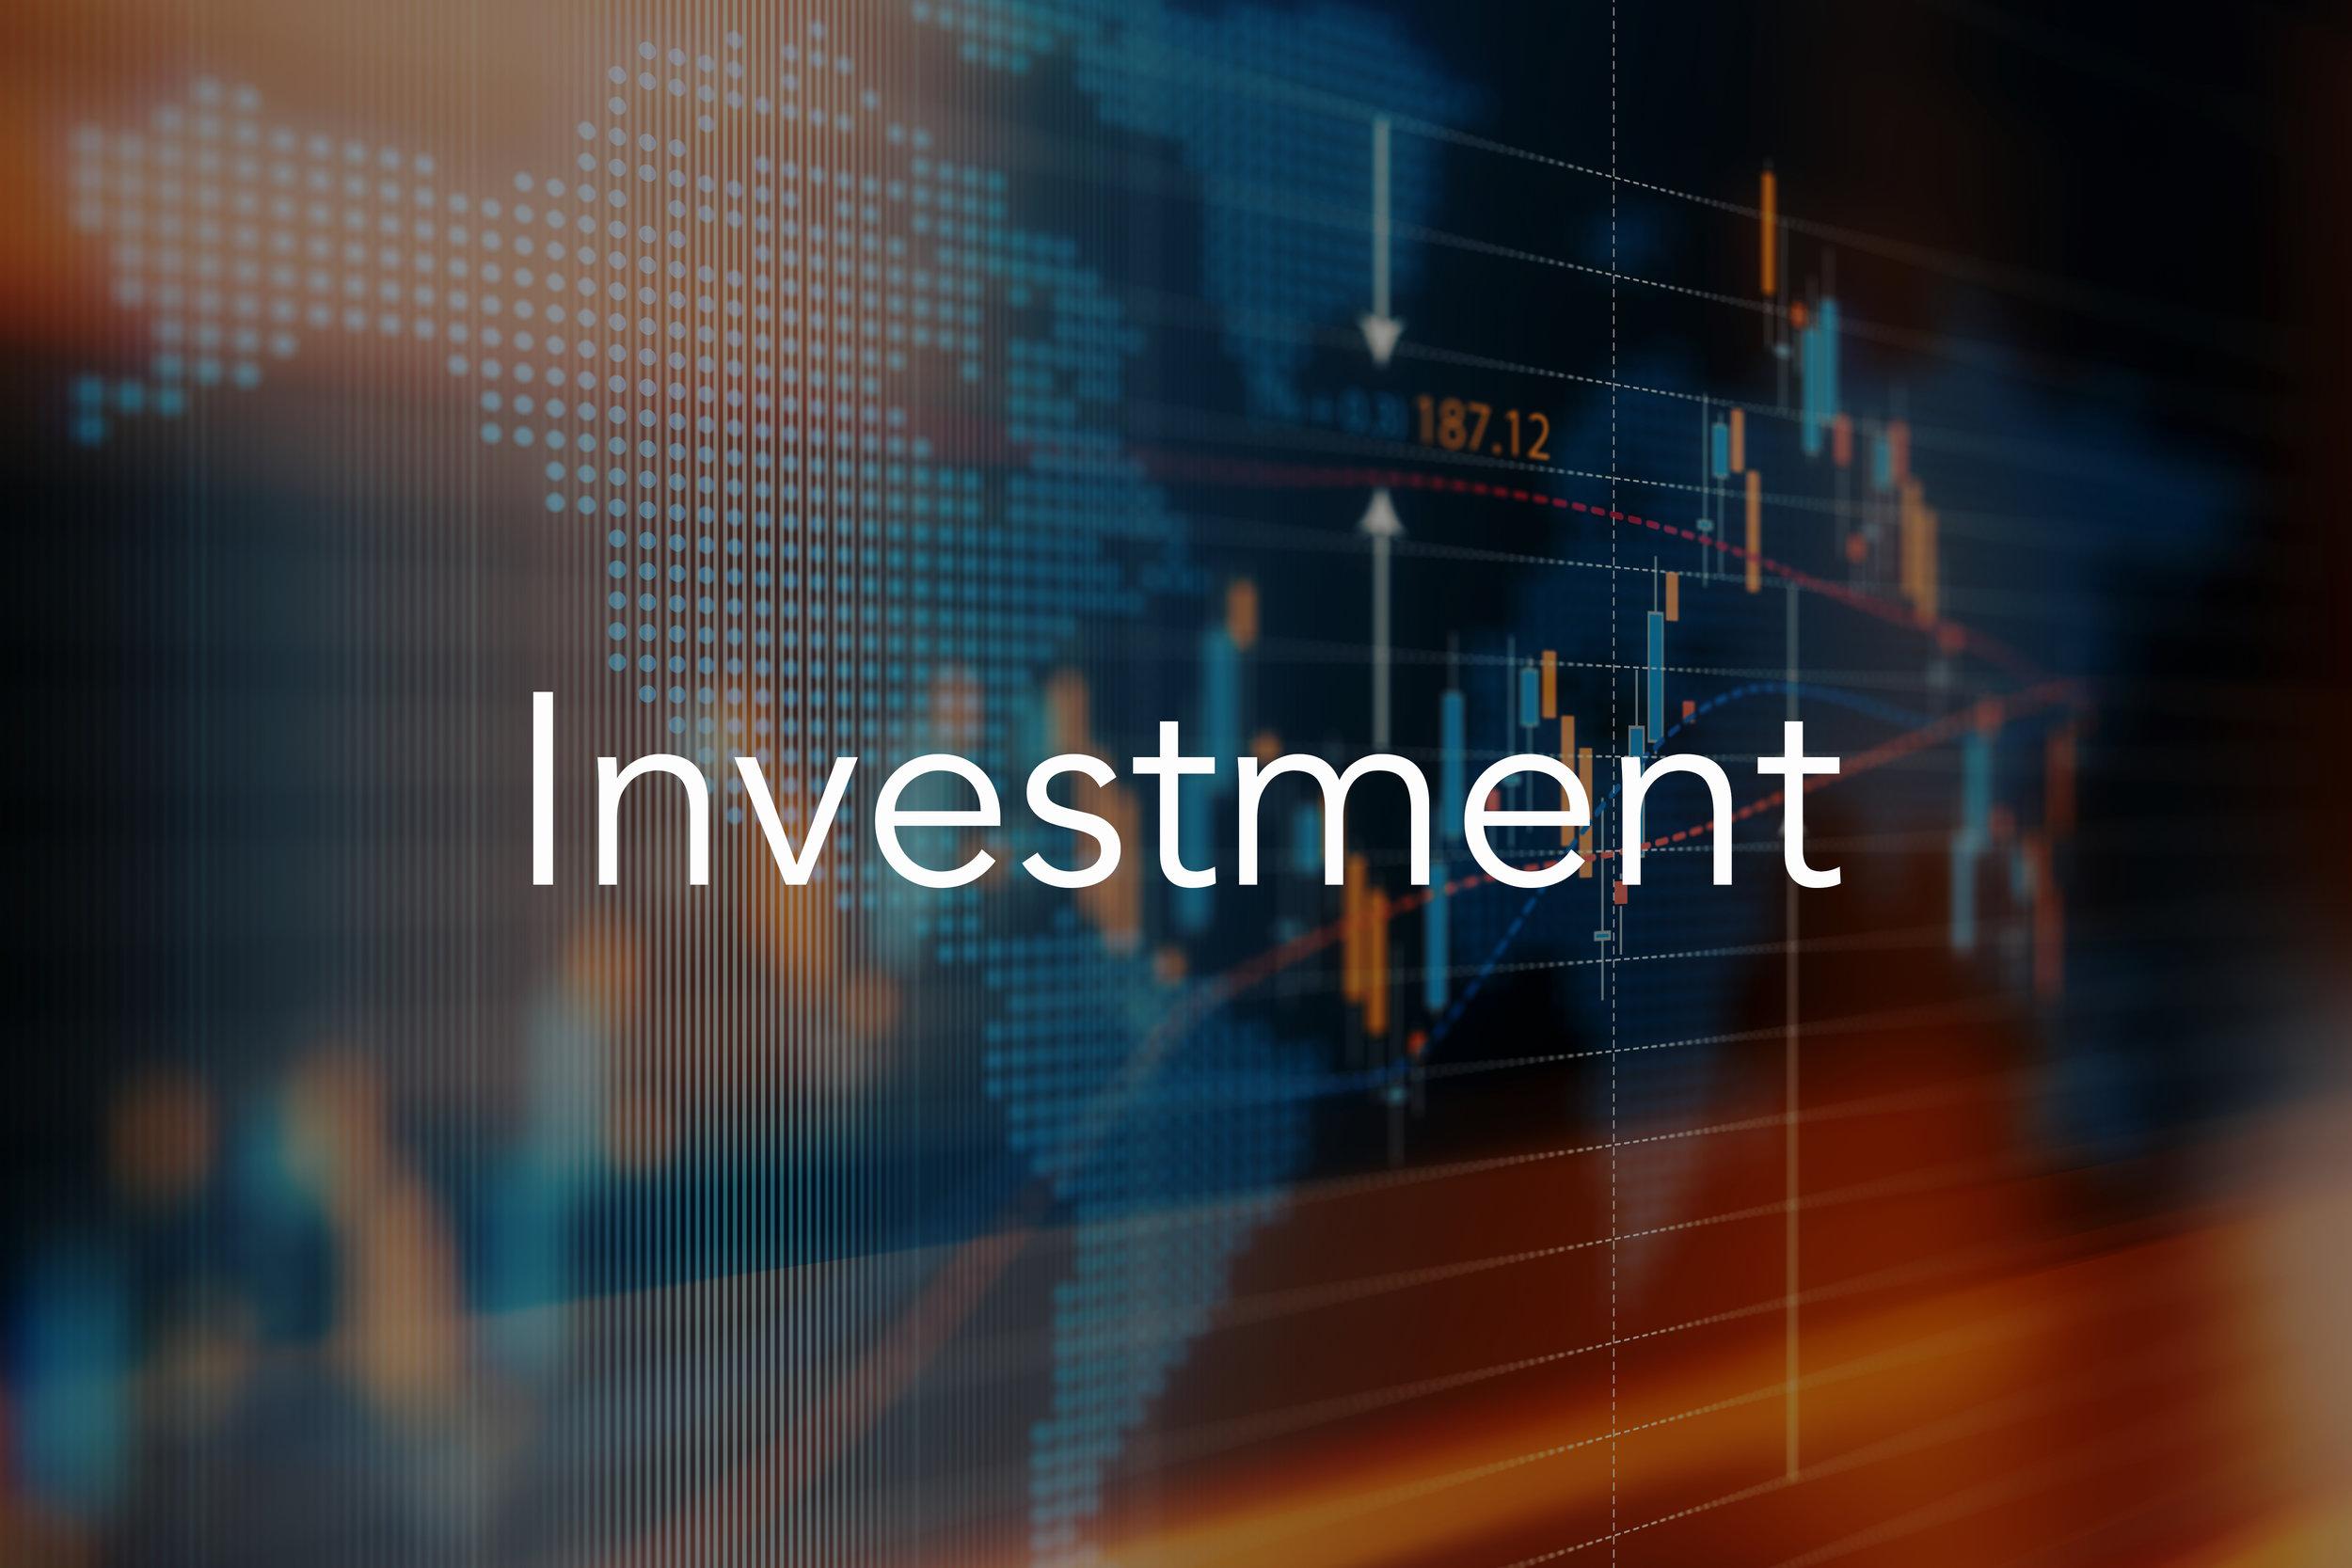 Create emerging market macroeconomic models for near real time market forecasting and political/social risk assessment on $5B portfolio